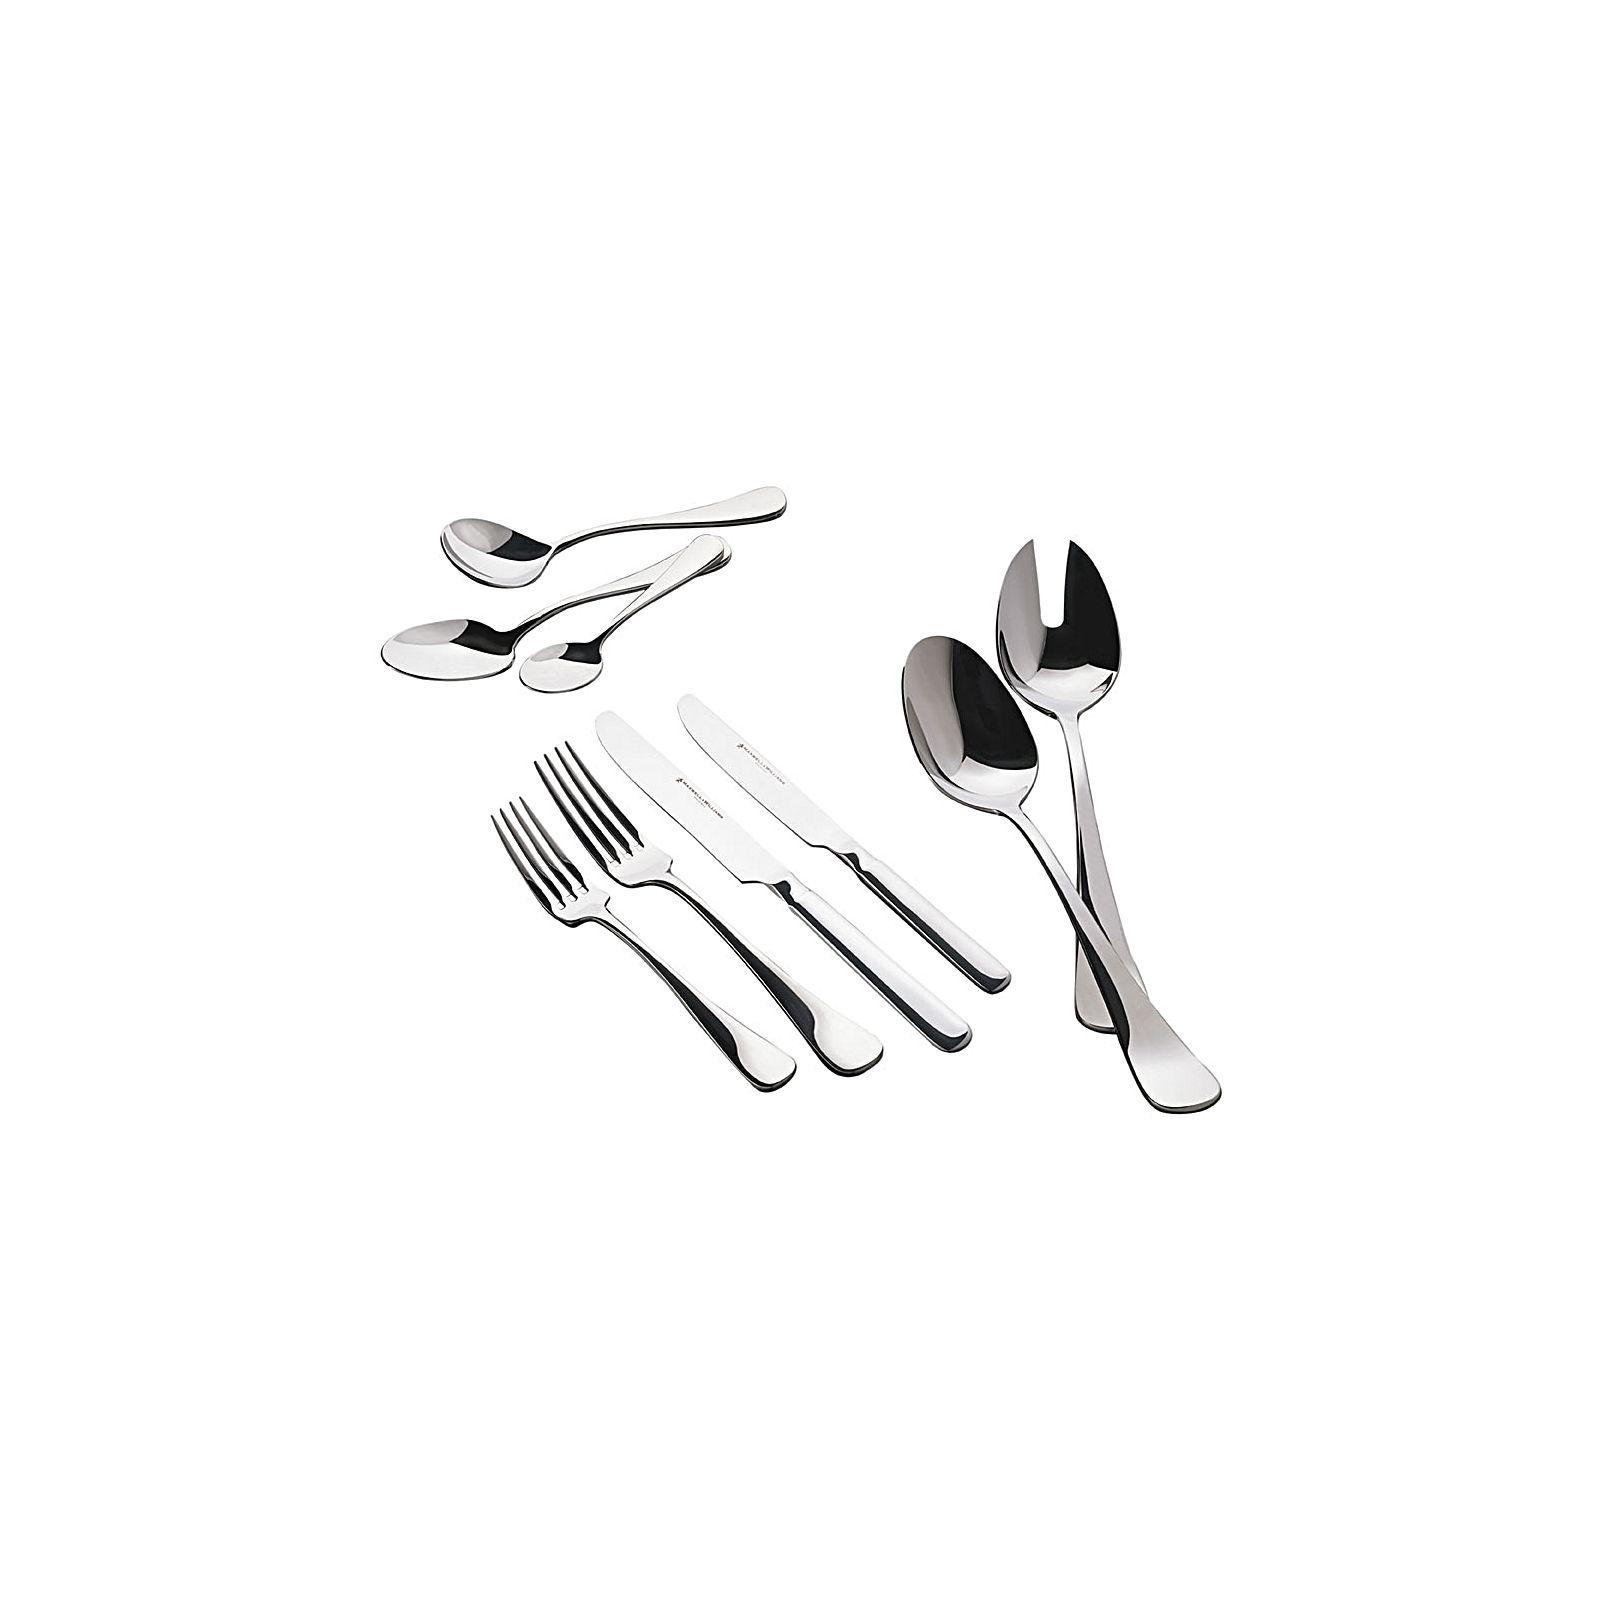 maxwell williams 58 piece madison cutlery set the potlok. Black Bedroom Furniture Sets. Home Design Ideas